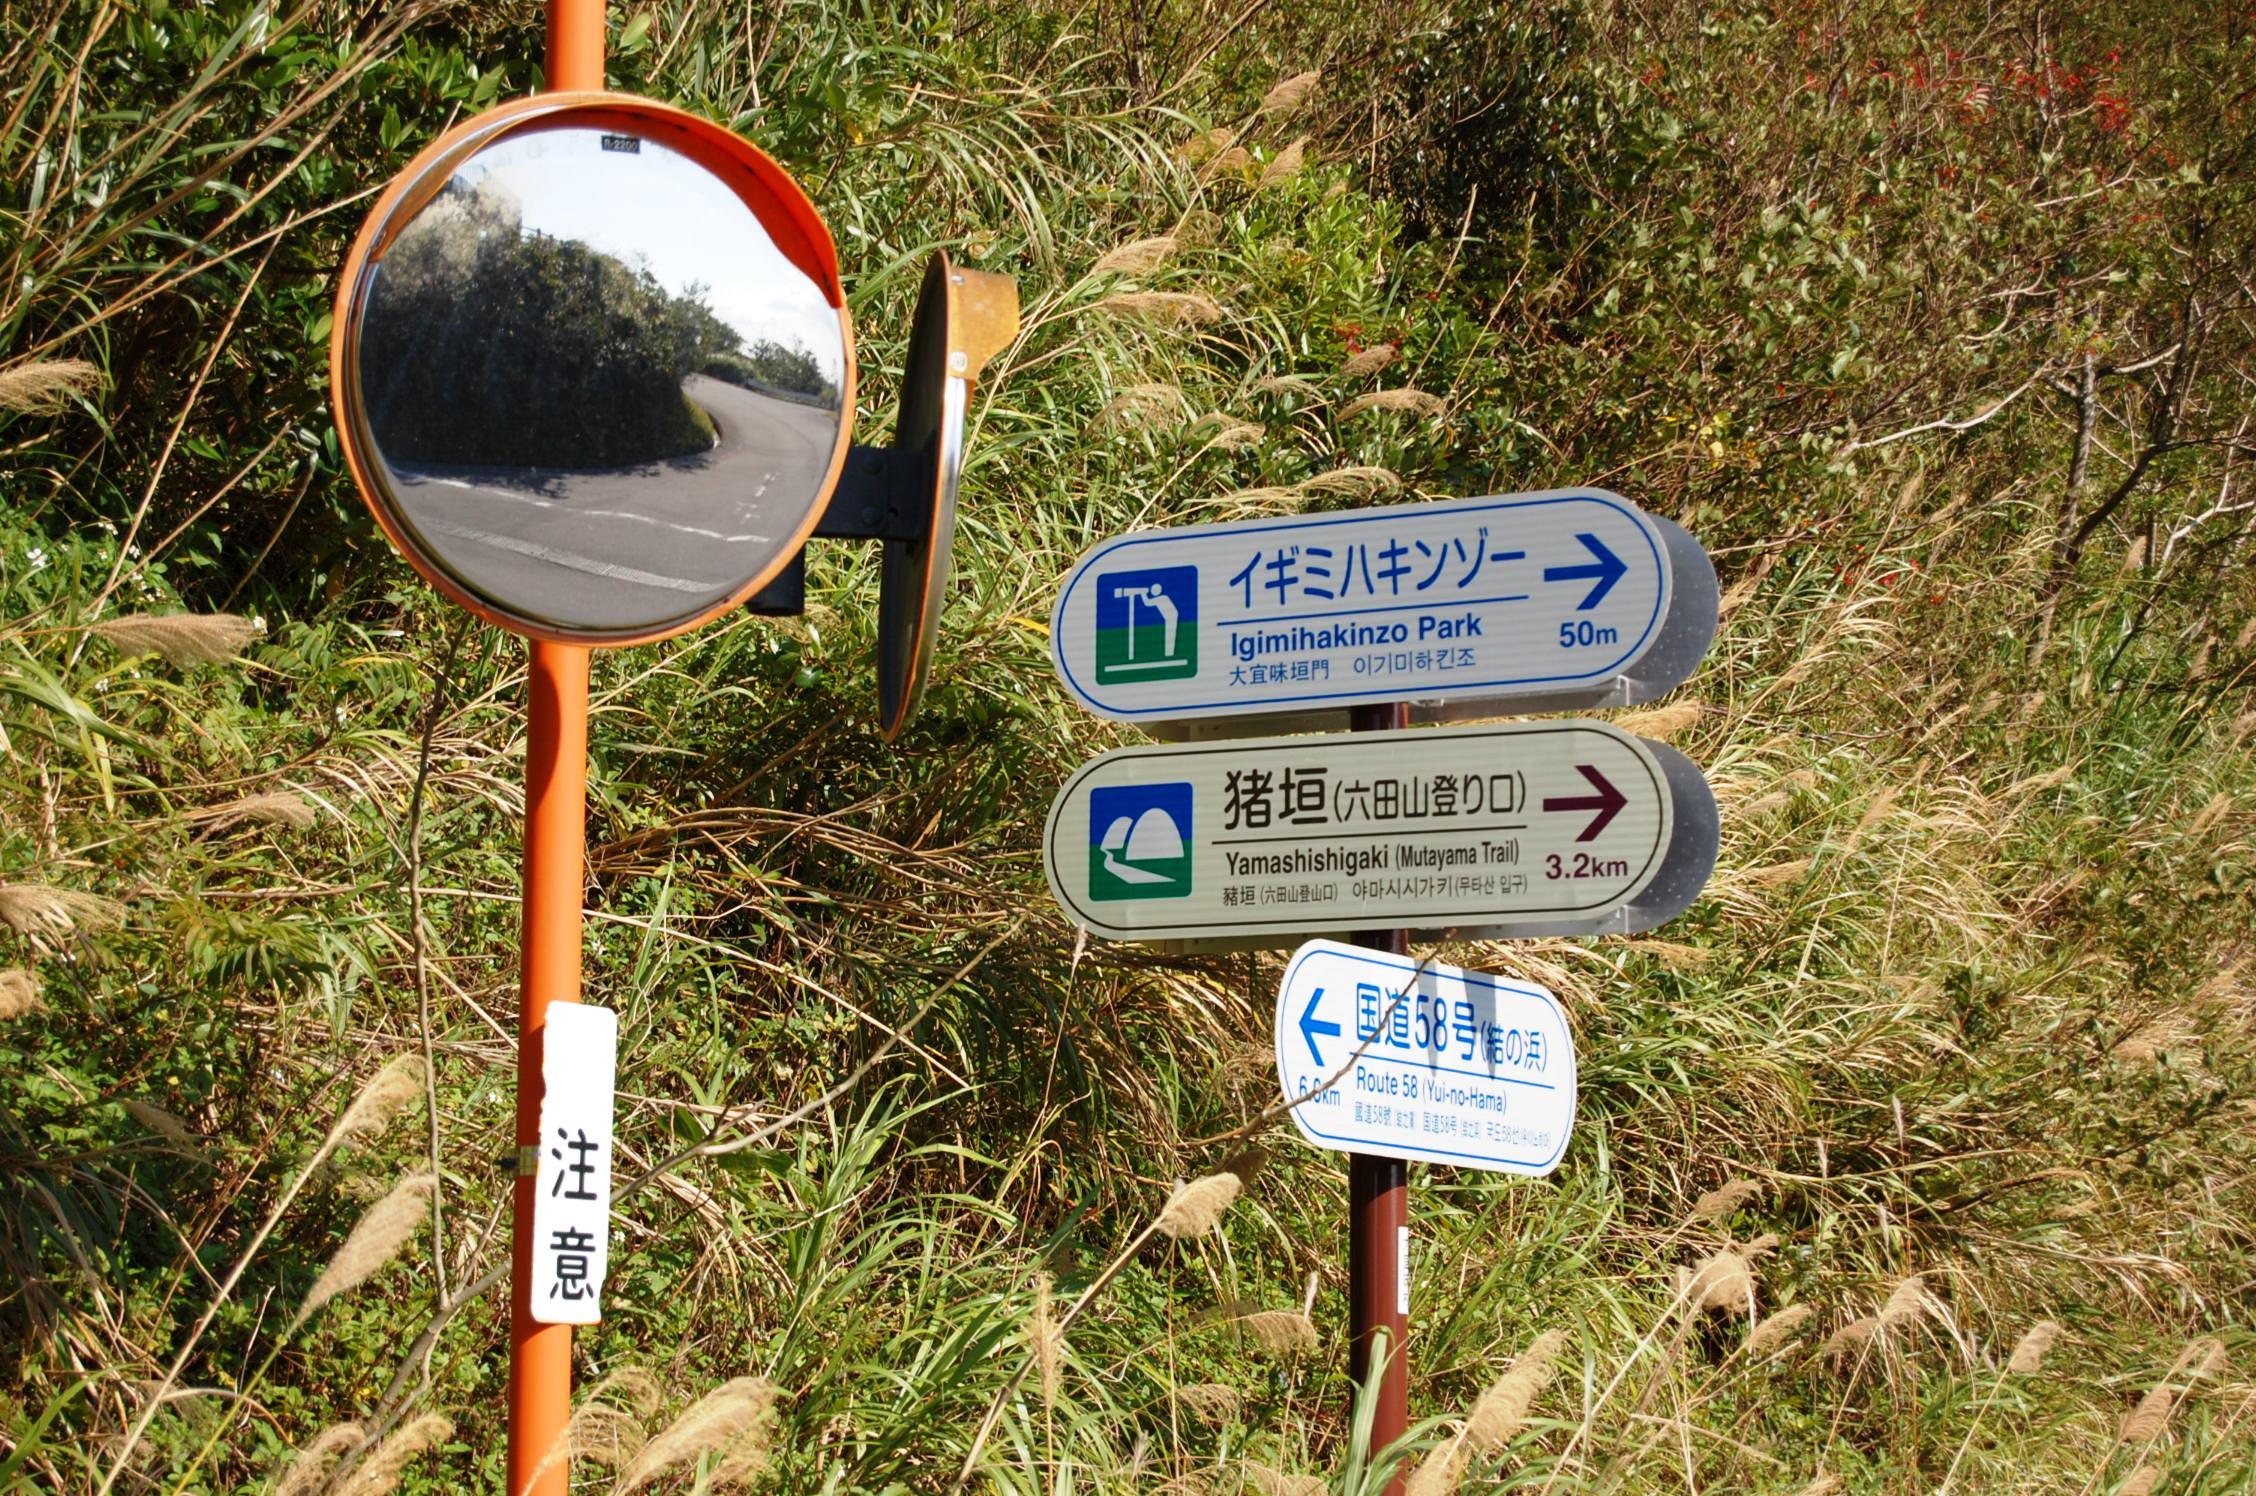 Igimihakinzo Park   Okinawa Hai!